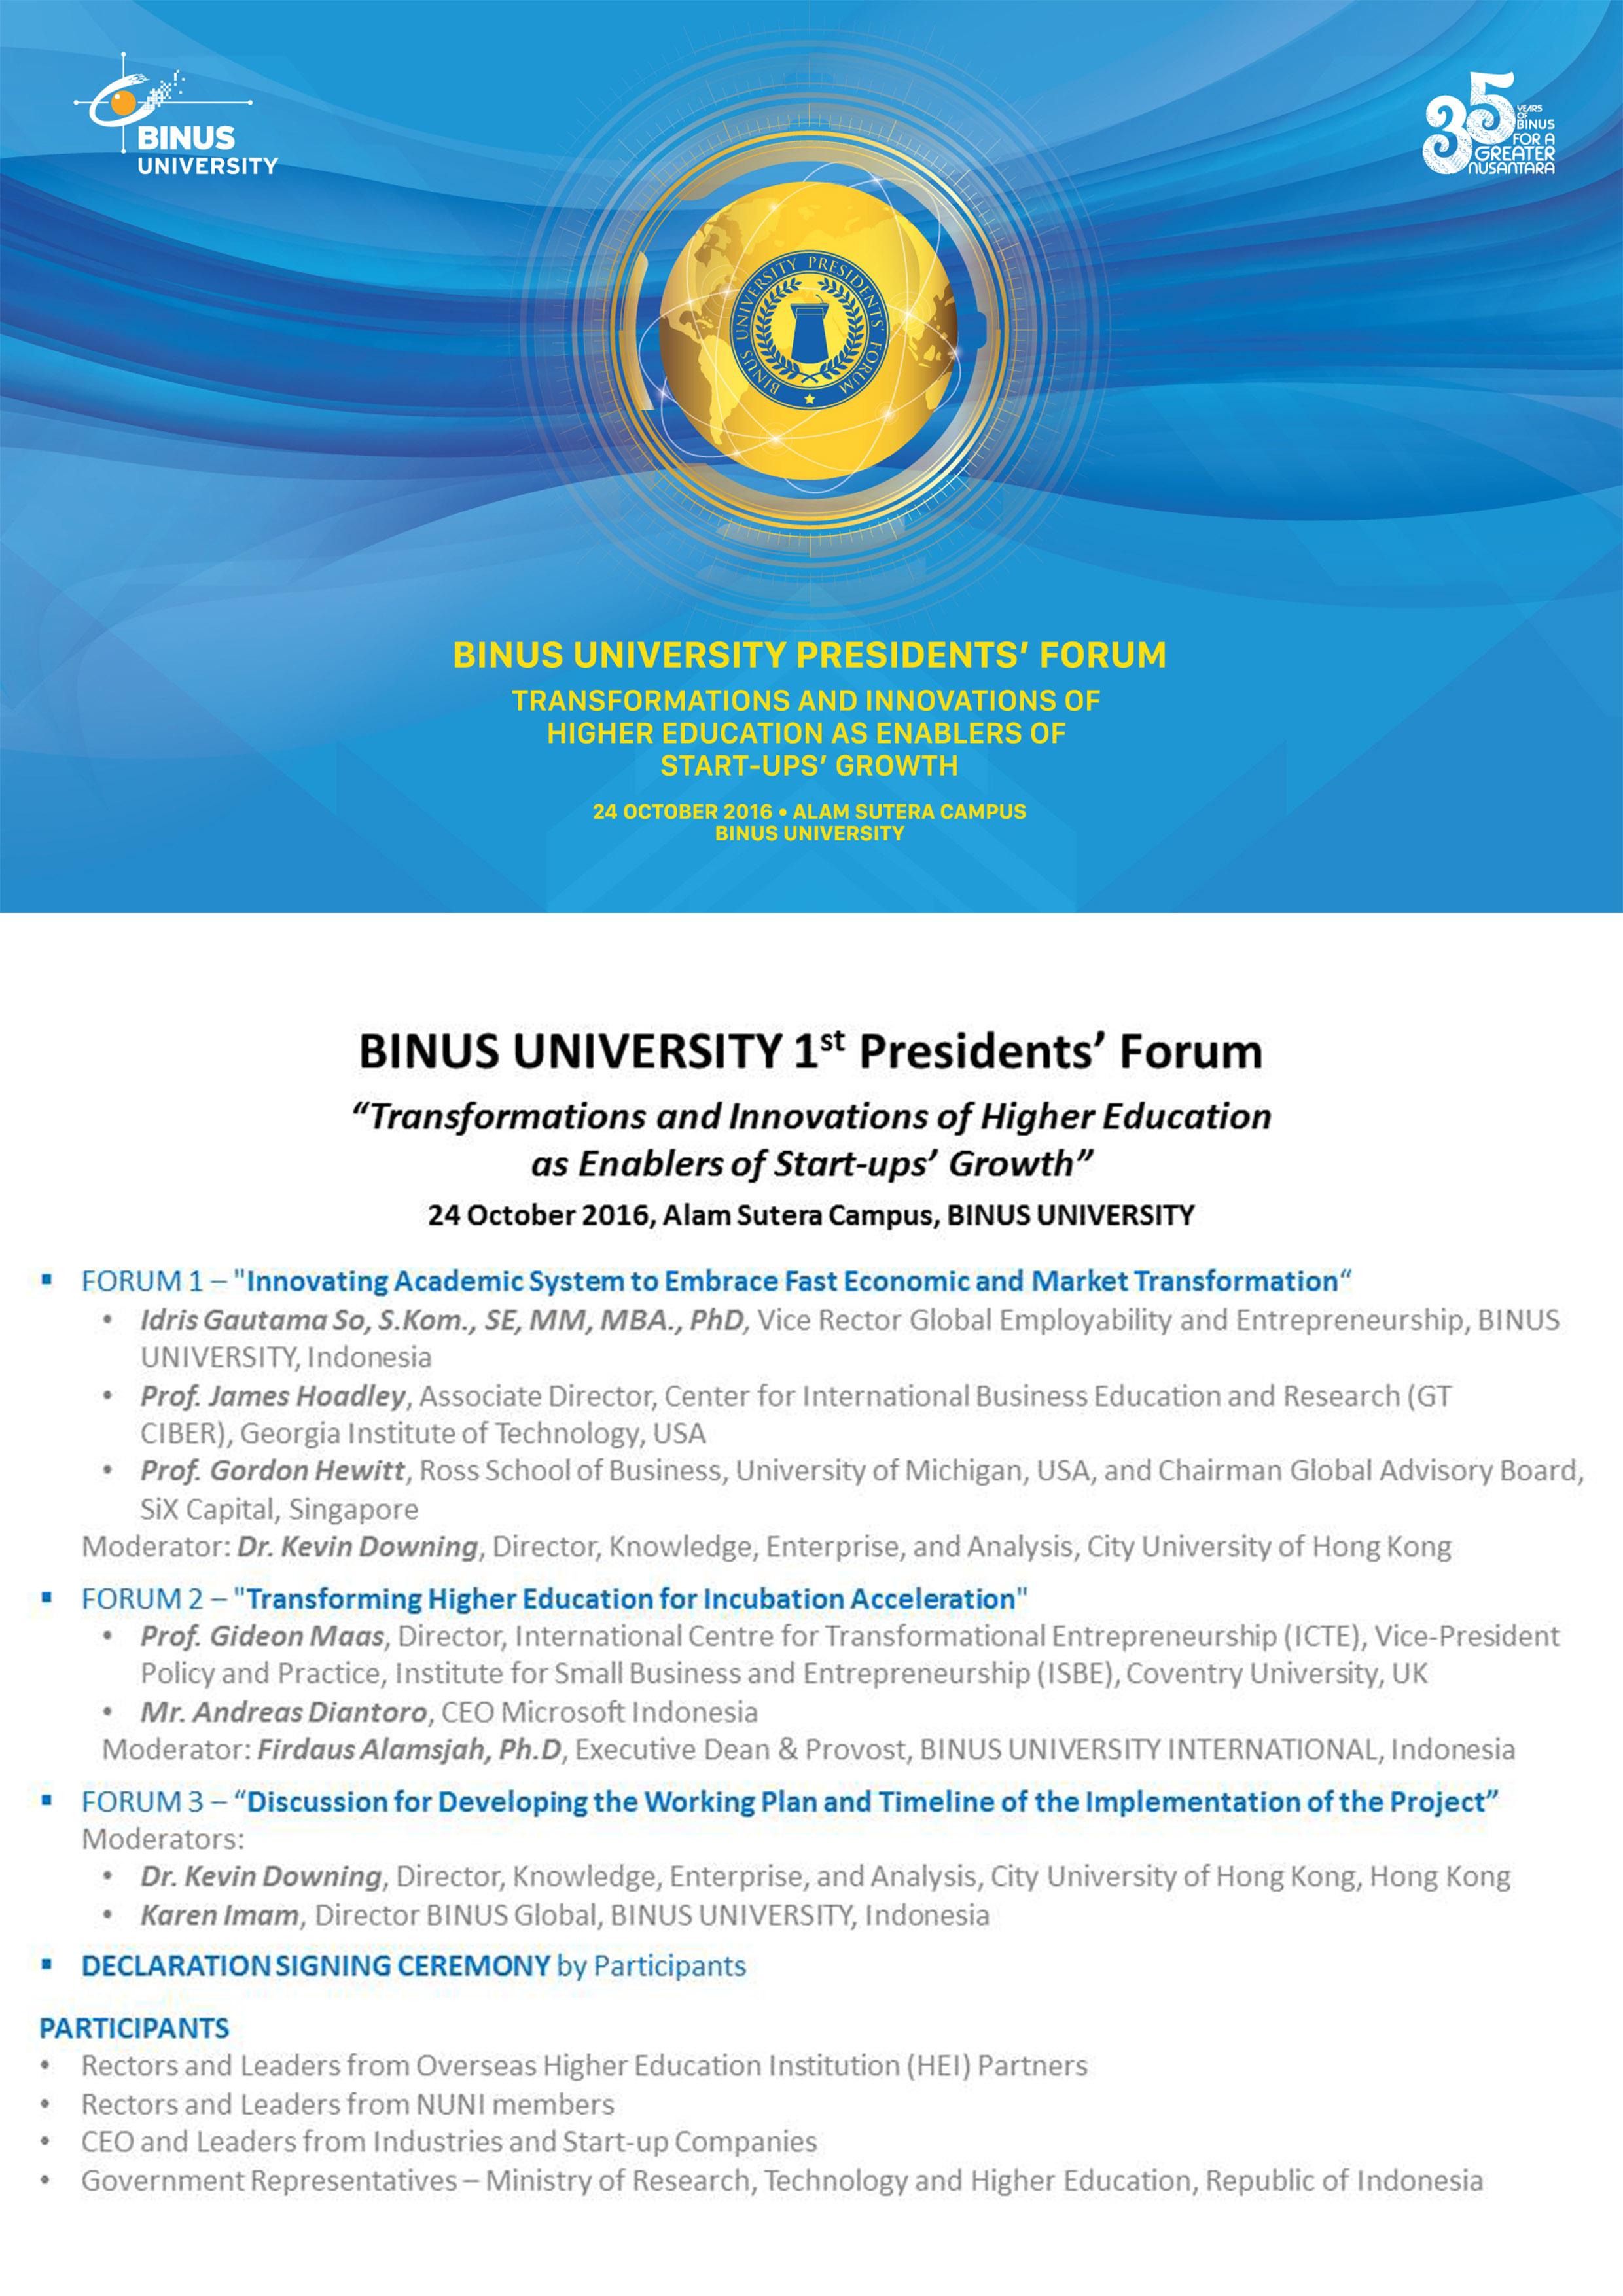 BINUS UNIVERSITY 1st Presidents' Forum